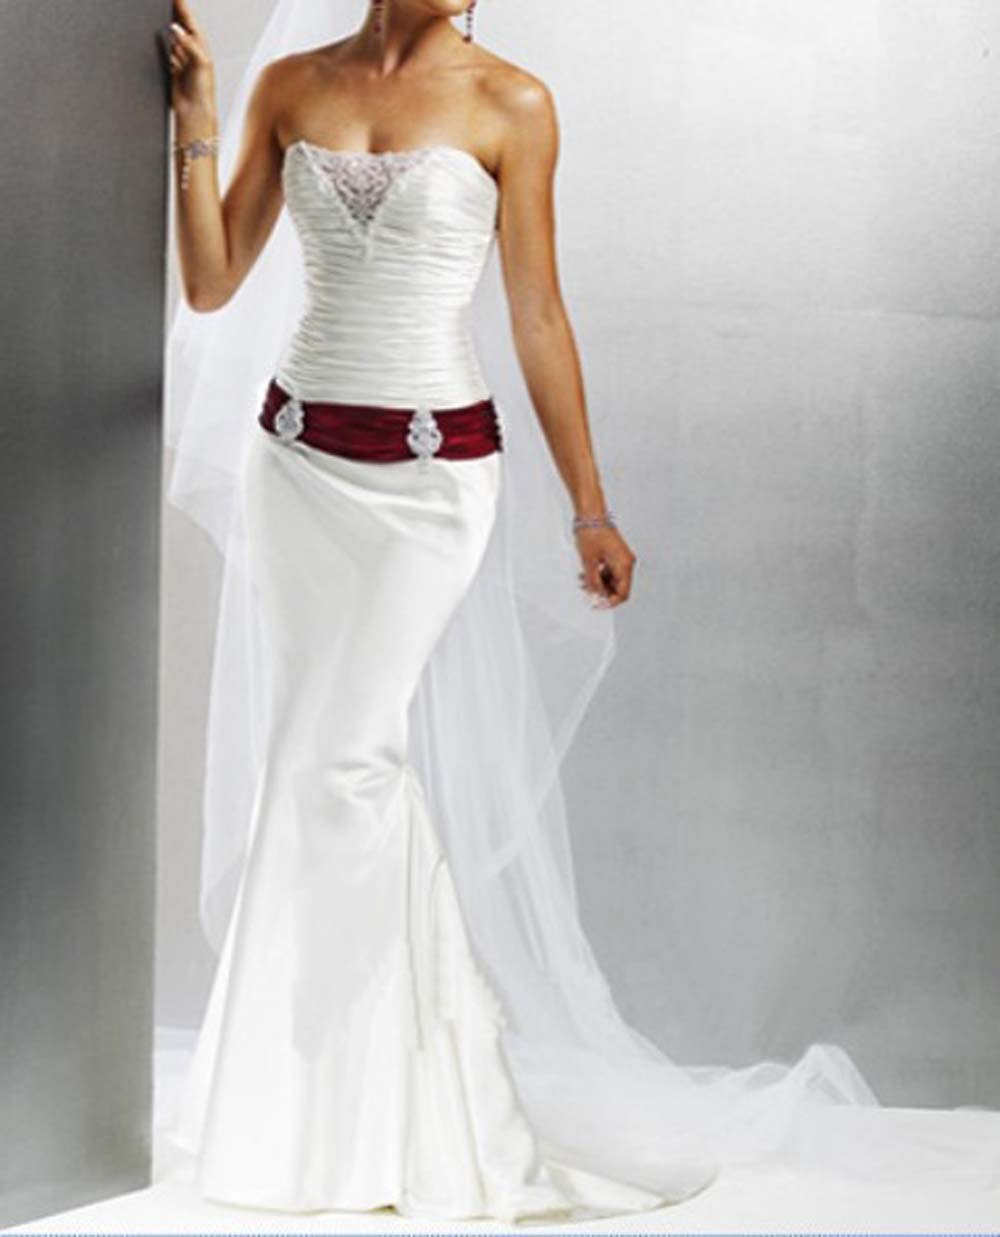 WESTERN WEDDING DRESSES ONLINE STYLISH WESTERN DRESSES FOR